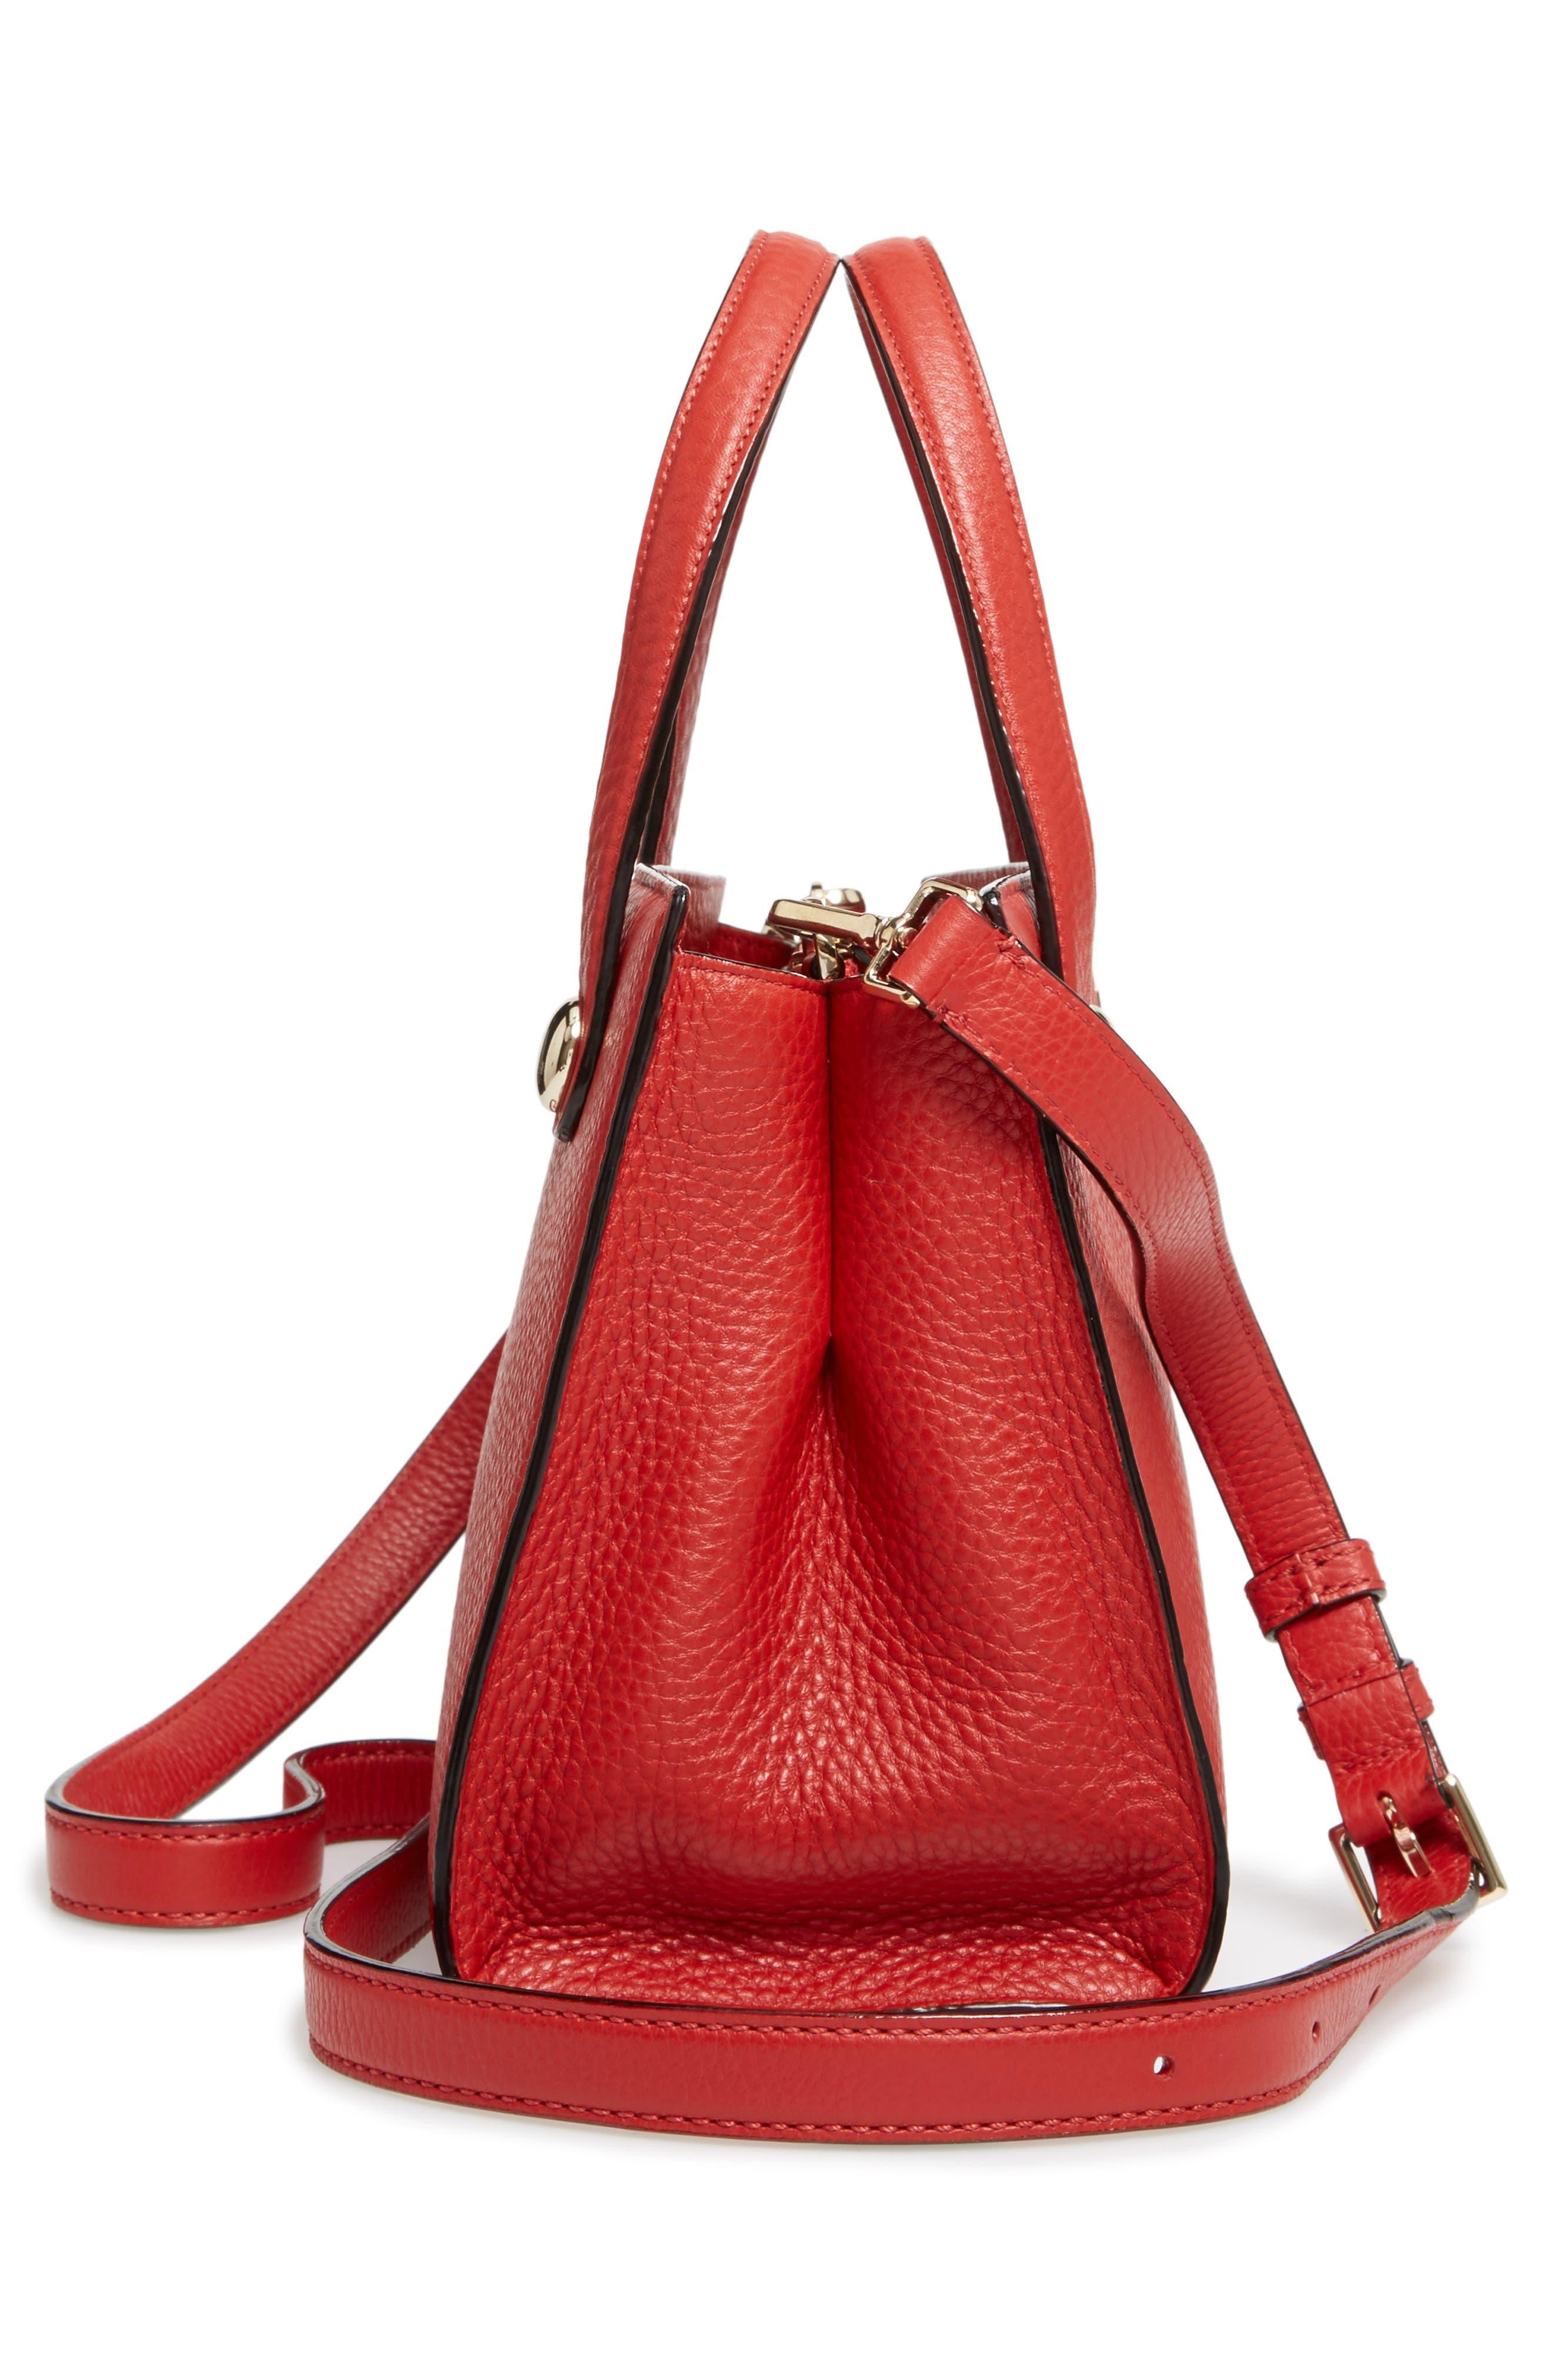 stewart street - little joy leather satchel,                             Alternate thumbnail 4, color,                             631